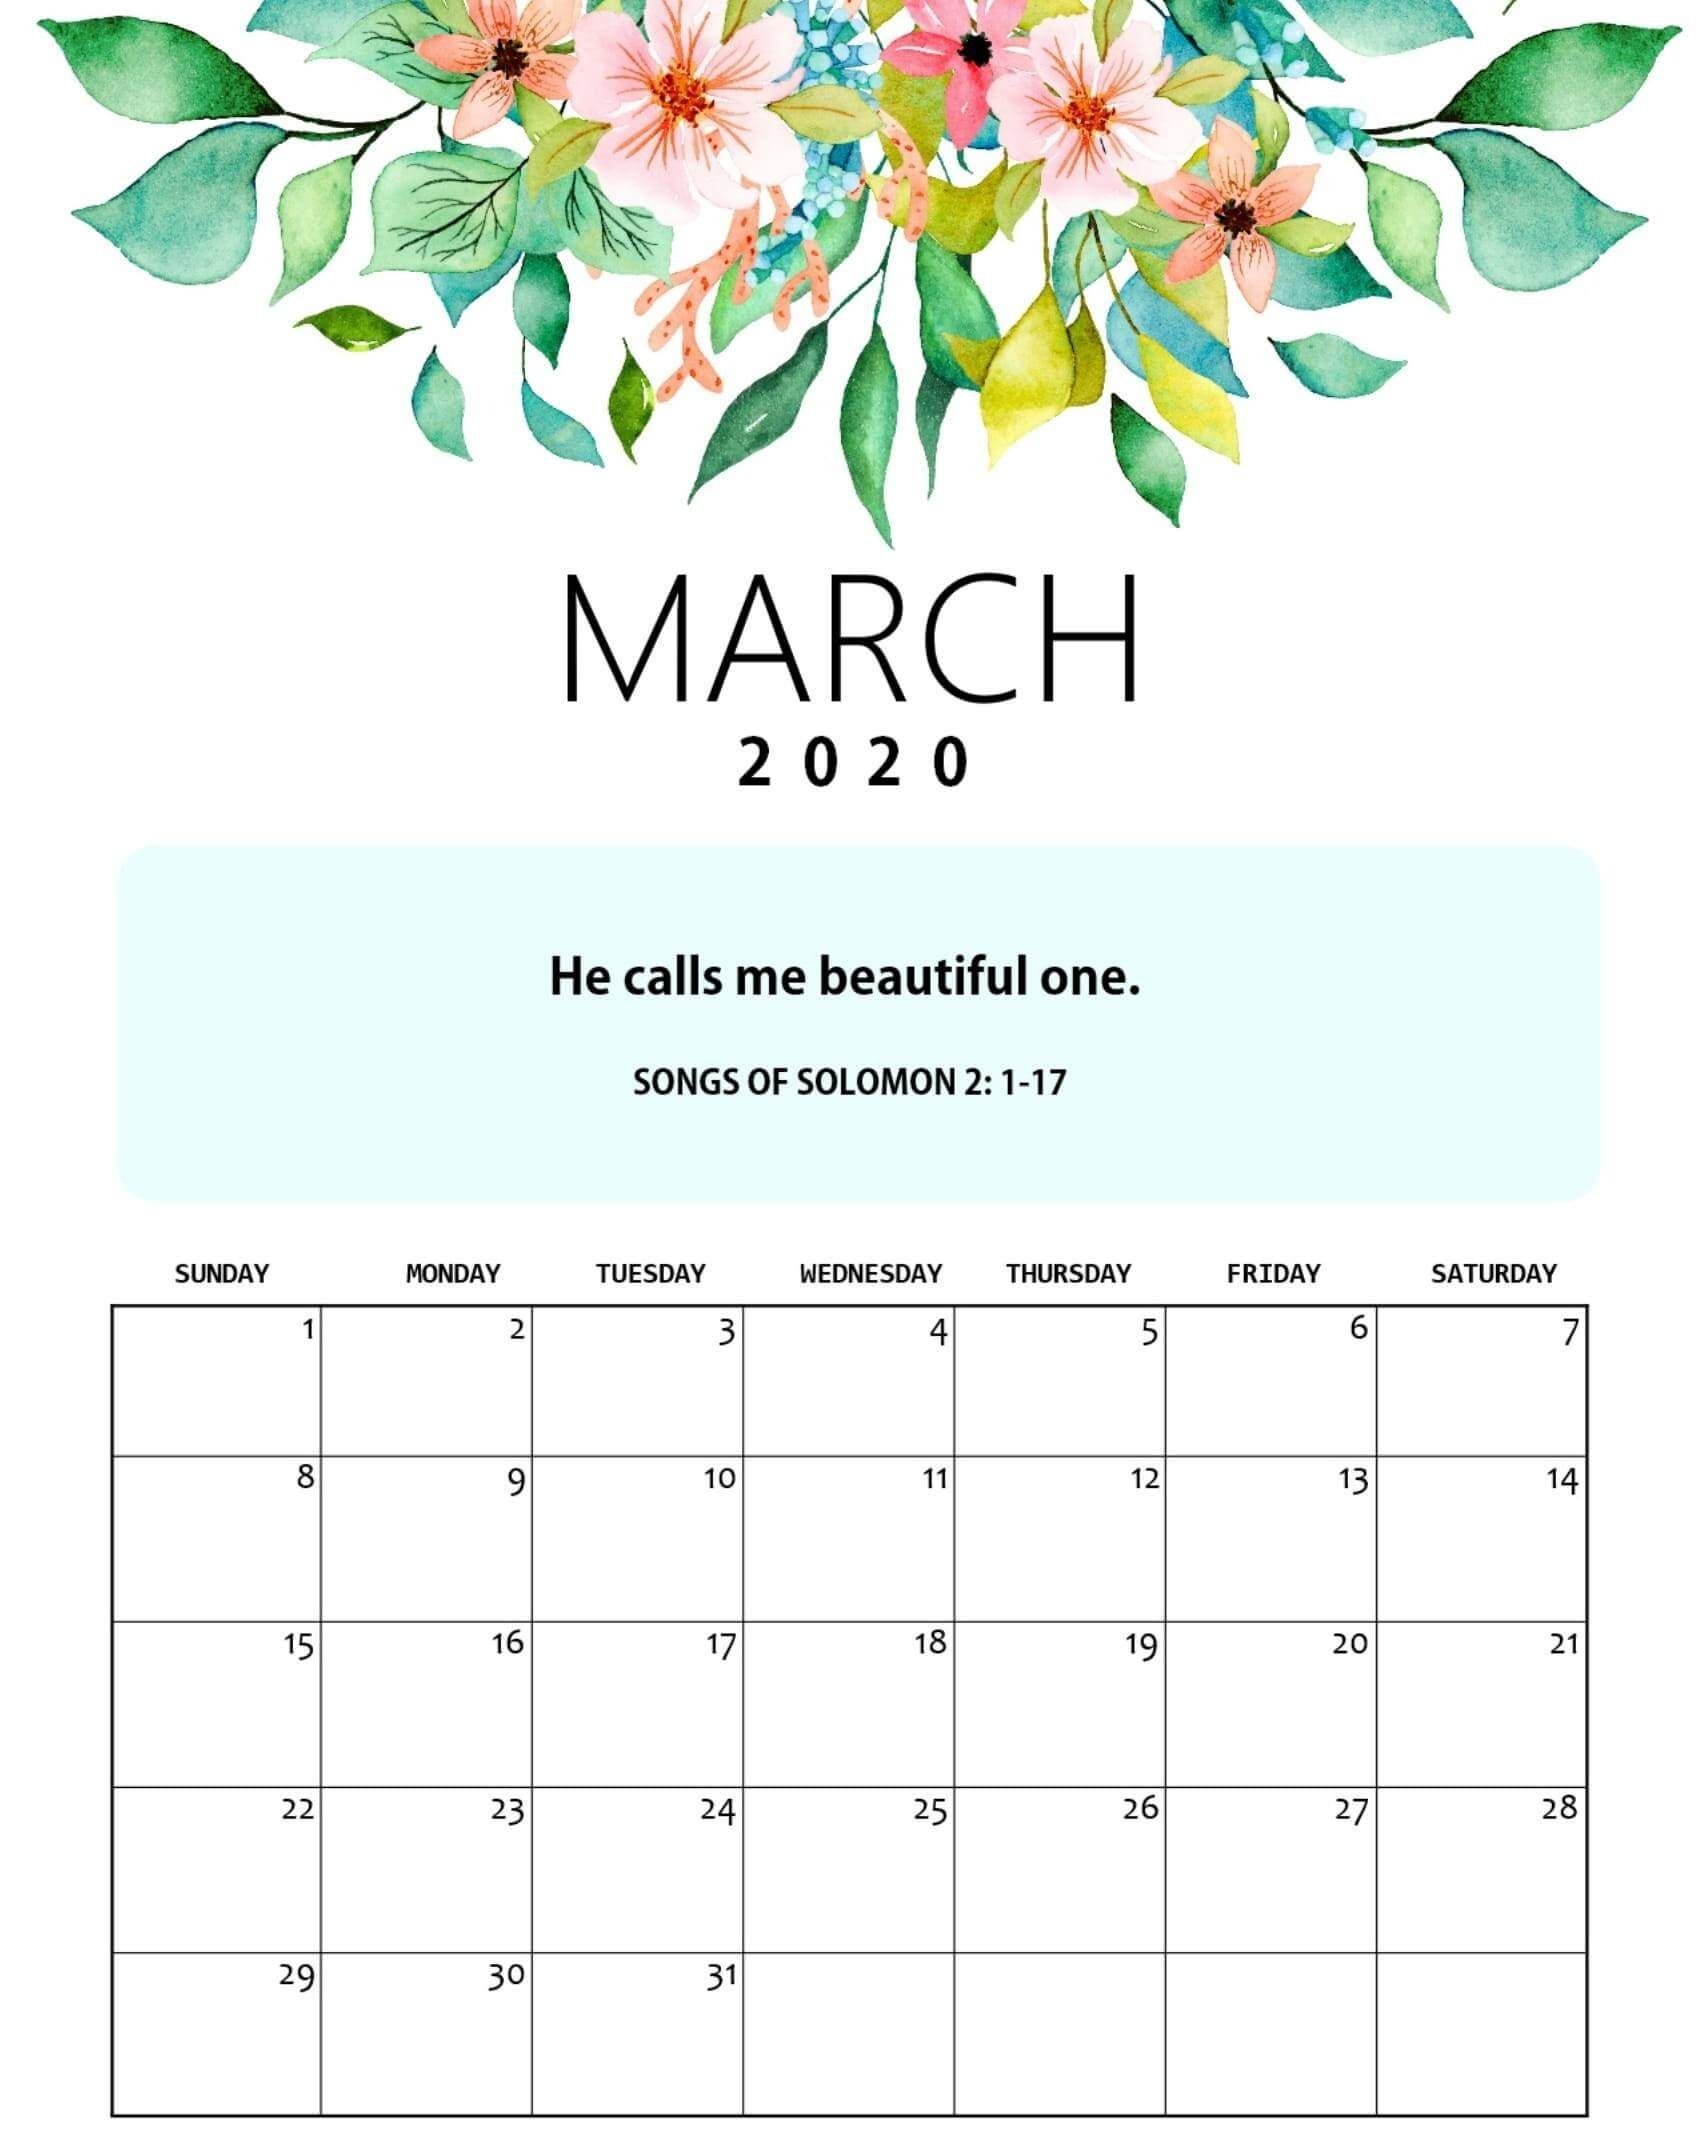 Cute March 2020 Calendar Archives - 2019 Calendars for ...